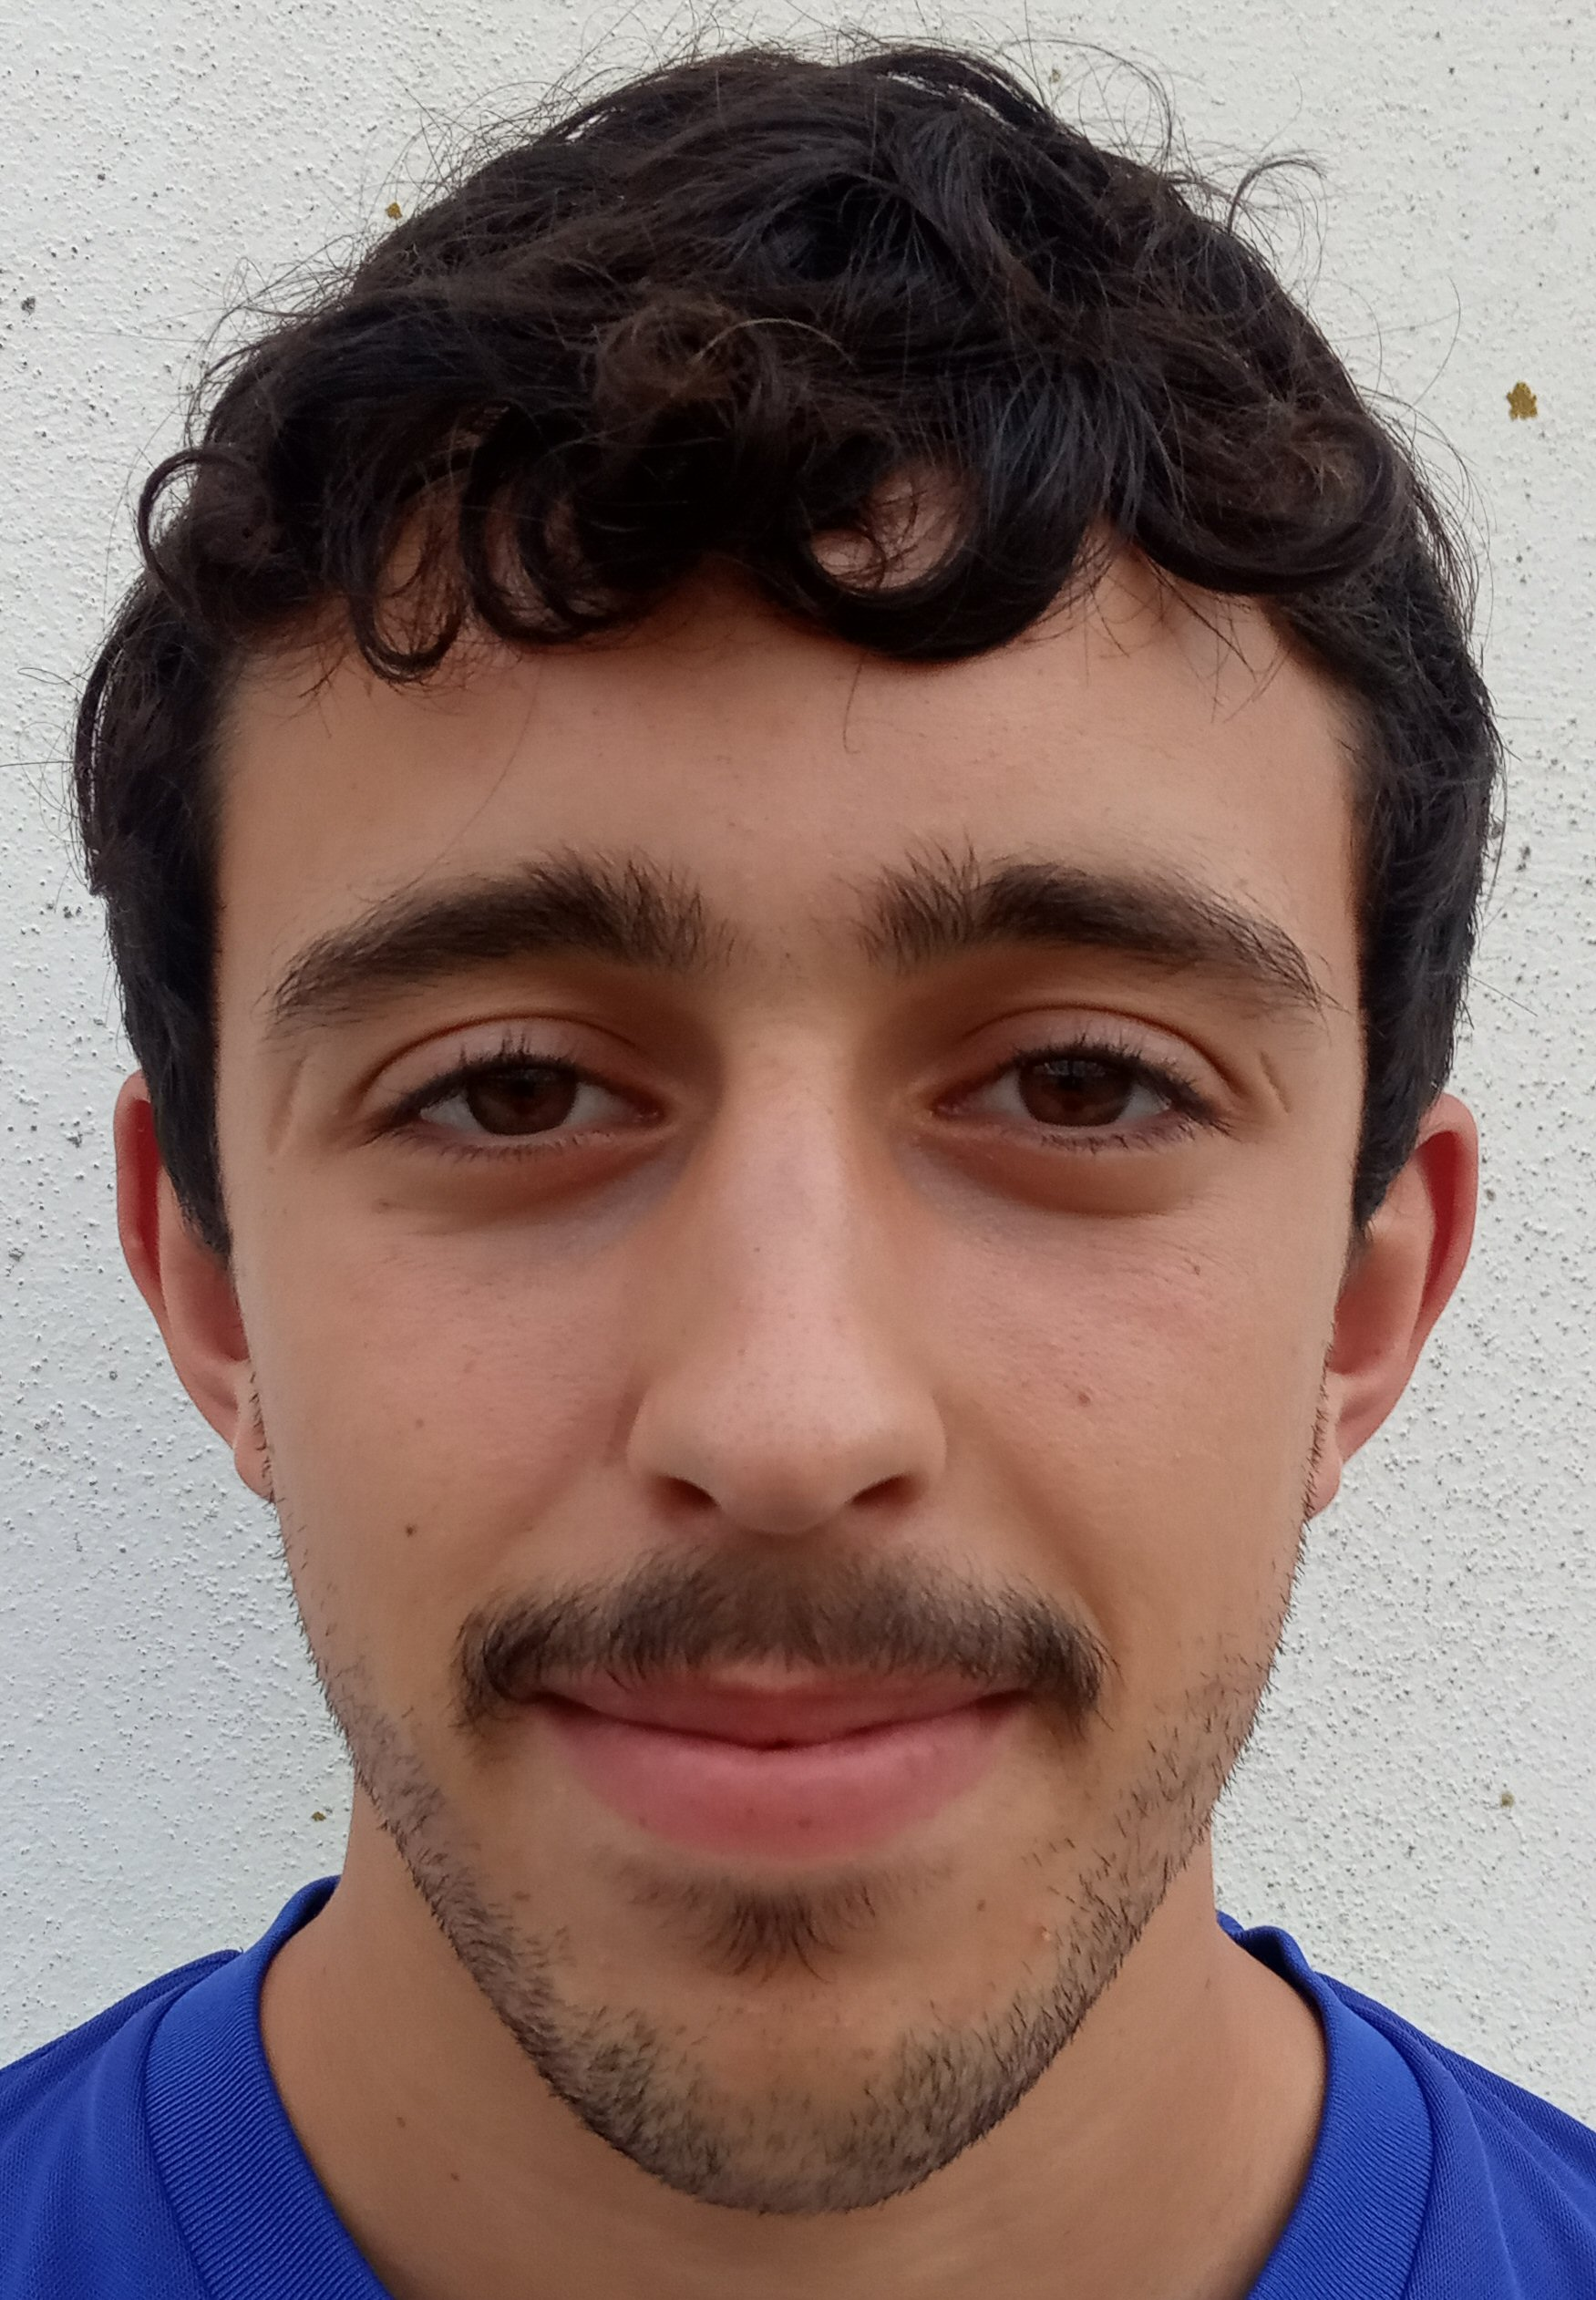 JOÃO PAULO DE JESUS RIBEIRO